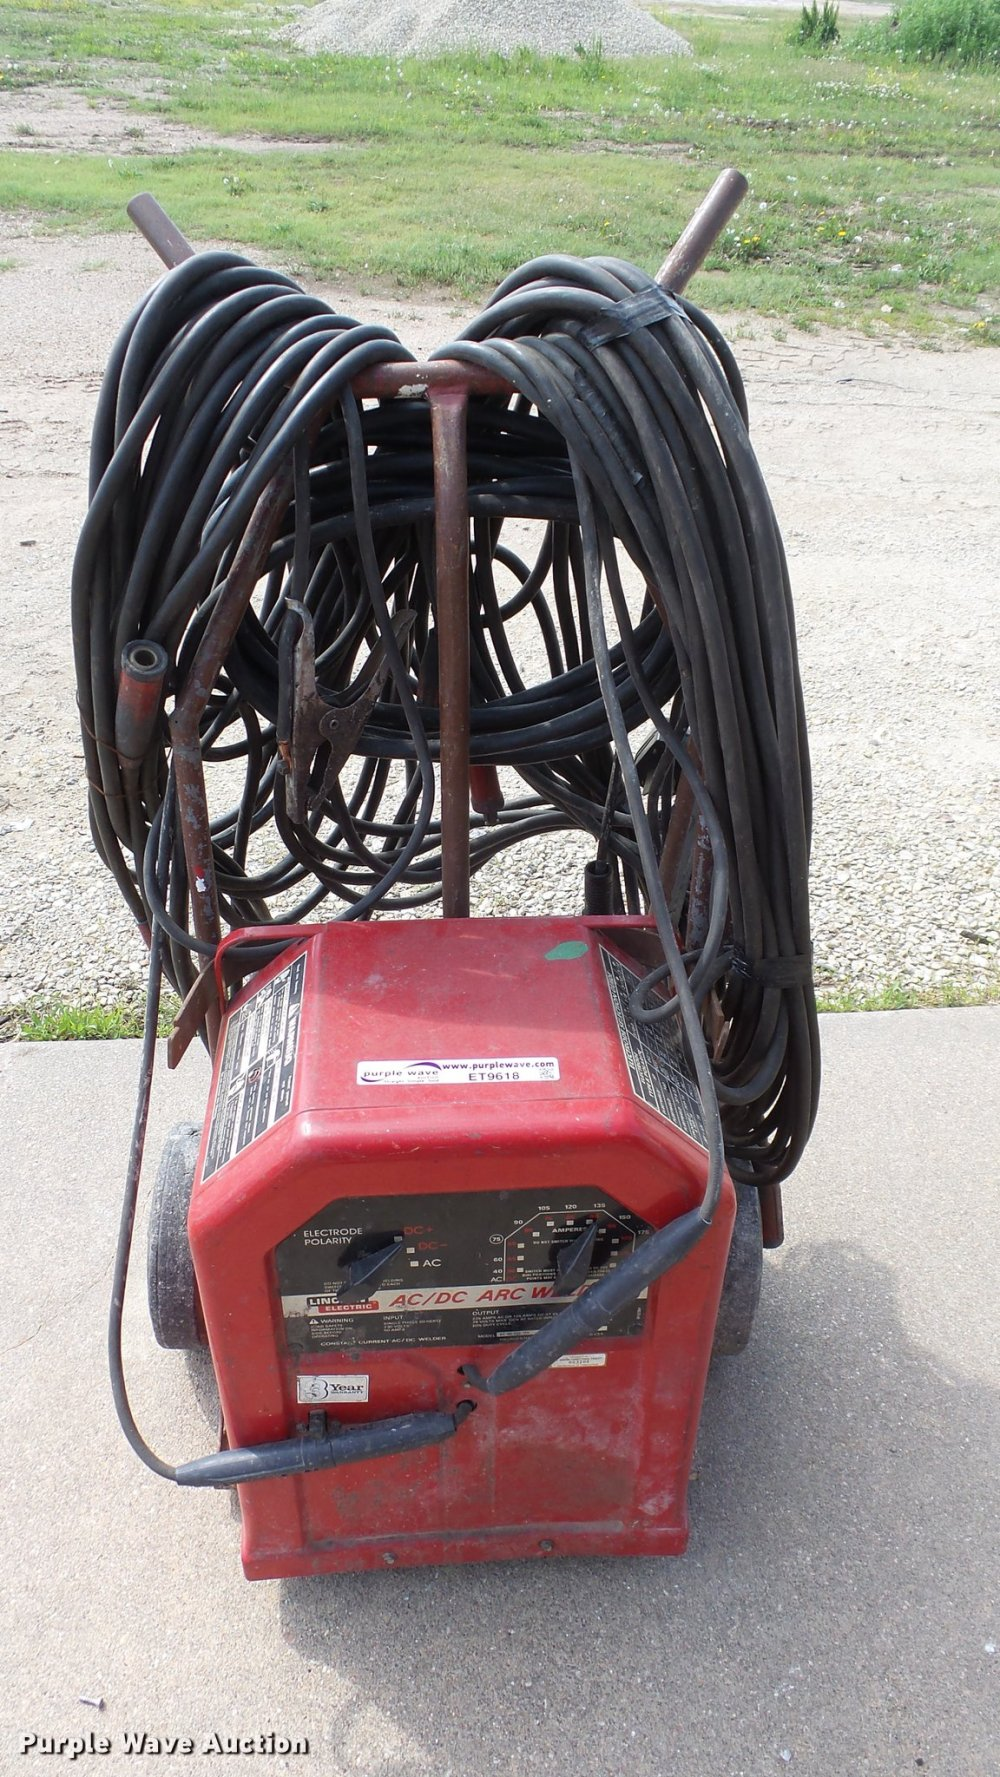 medium resolution of et9618 image for item et9618 lincoln 225 125 ac dc arc welder